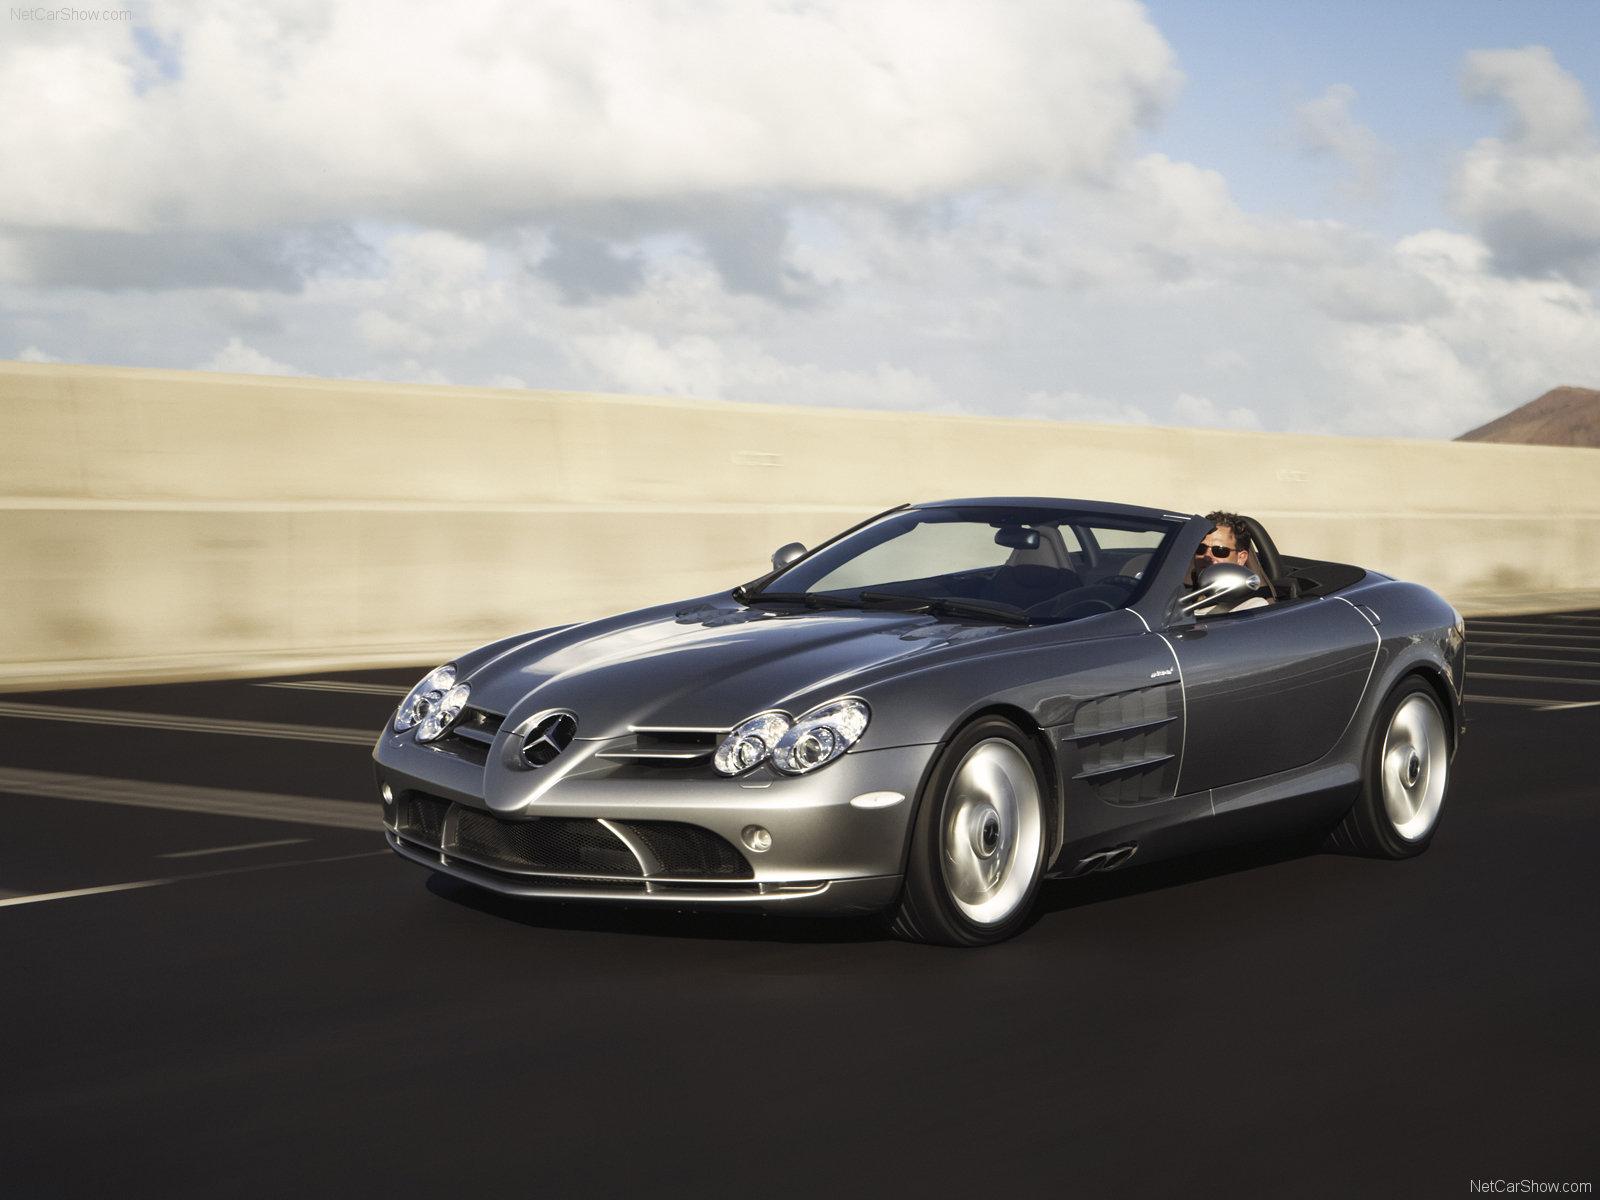 Mercedes Benz Slr Mclaren Roadster Photos Photogallery